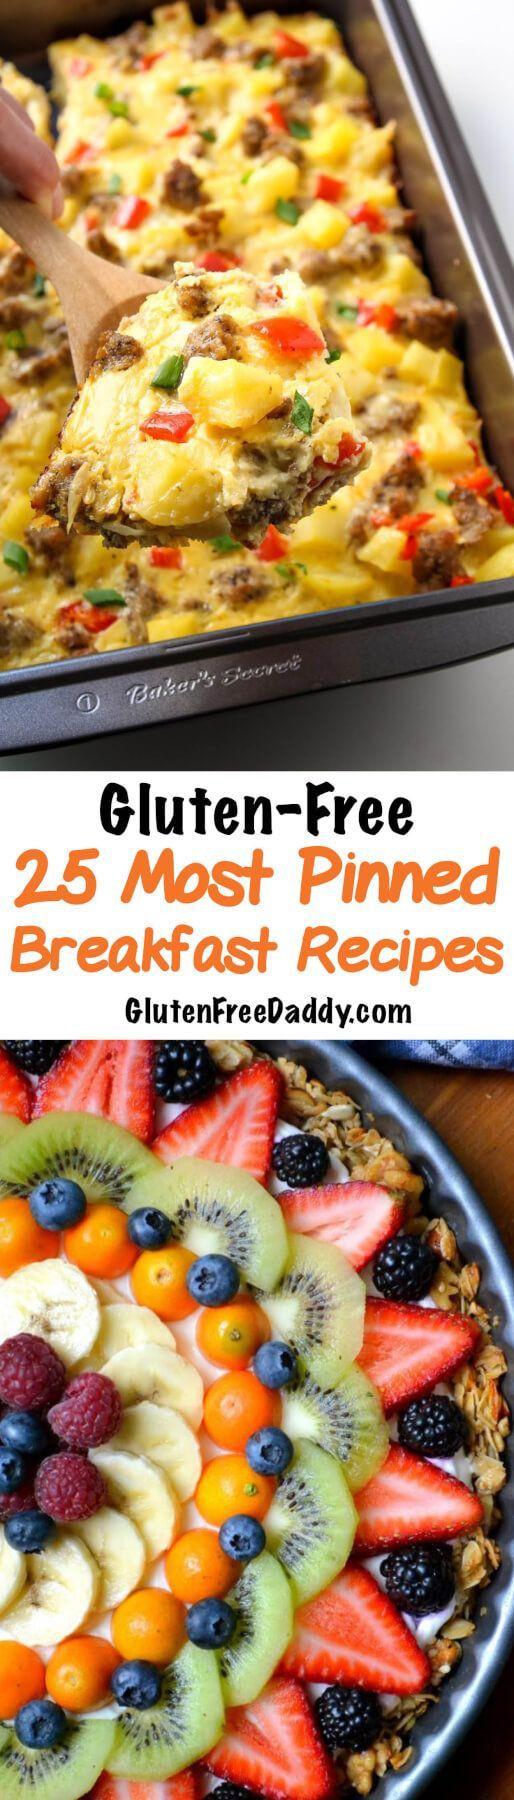 Dairy Free Brunch Recipes  Best 25 Gluten free list ideas on Pinterest